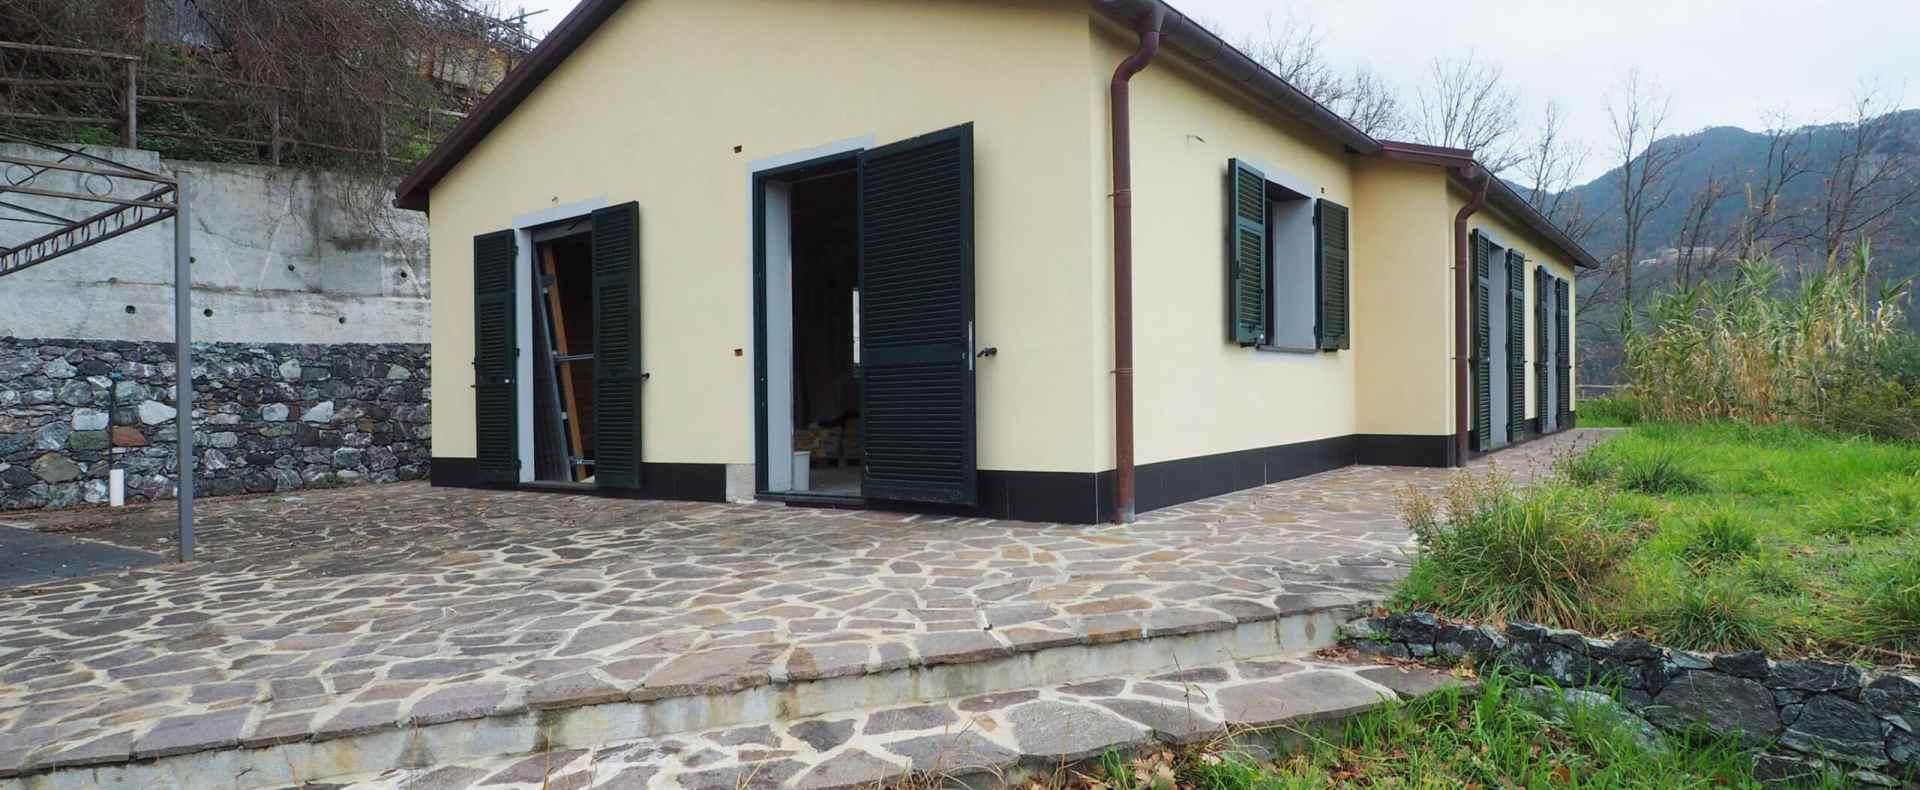 Villa con piscina a Framura - Casa indipendente in vendita - Messinalux